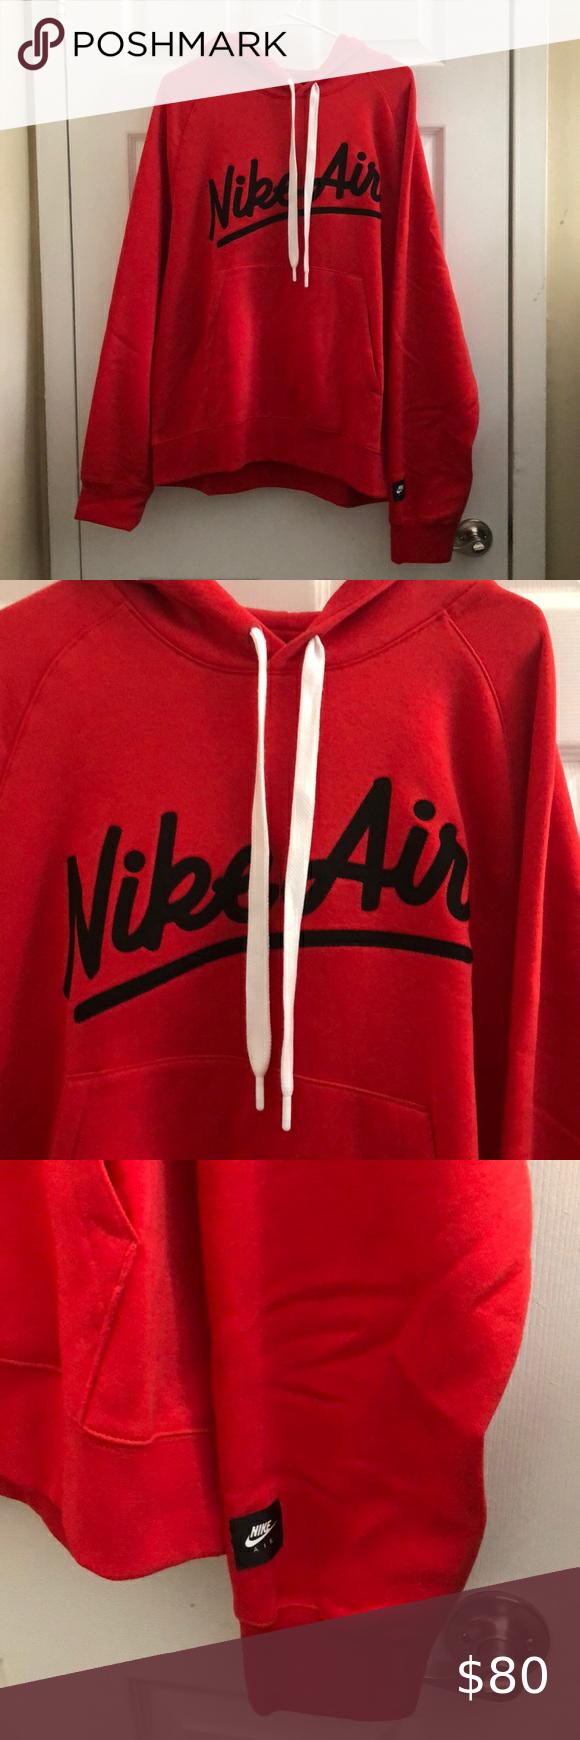 Nwt Nike Air Red Pullover Hoodie W Cursive Design Red Pullover Pullover Hoodie Sweatshirt Shirt [ 1740 x 580 Pixel ]